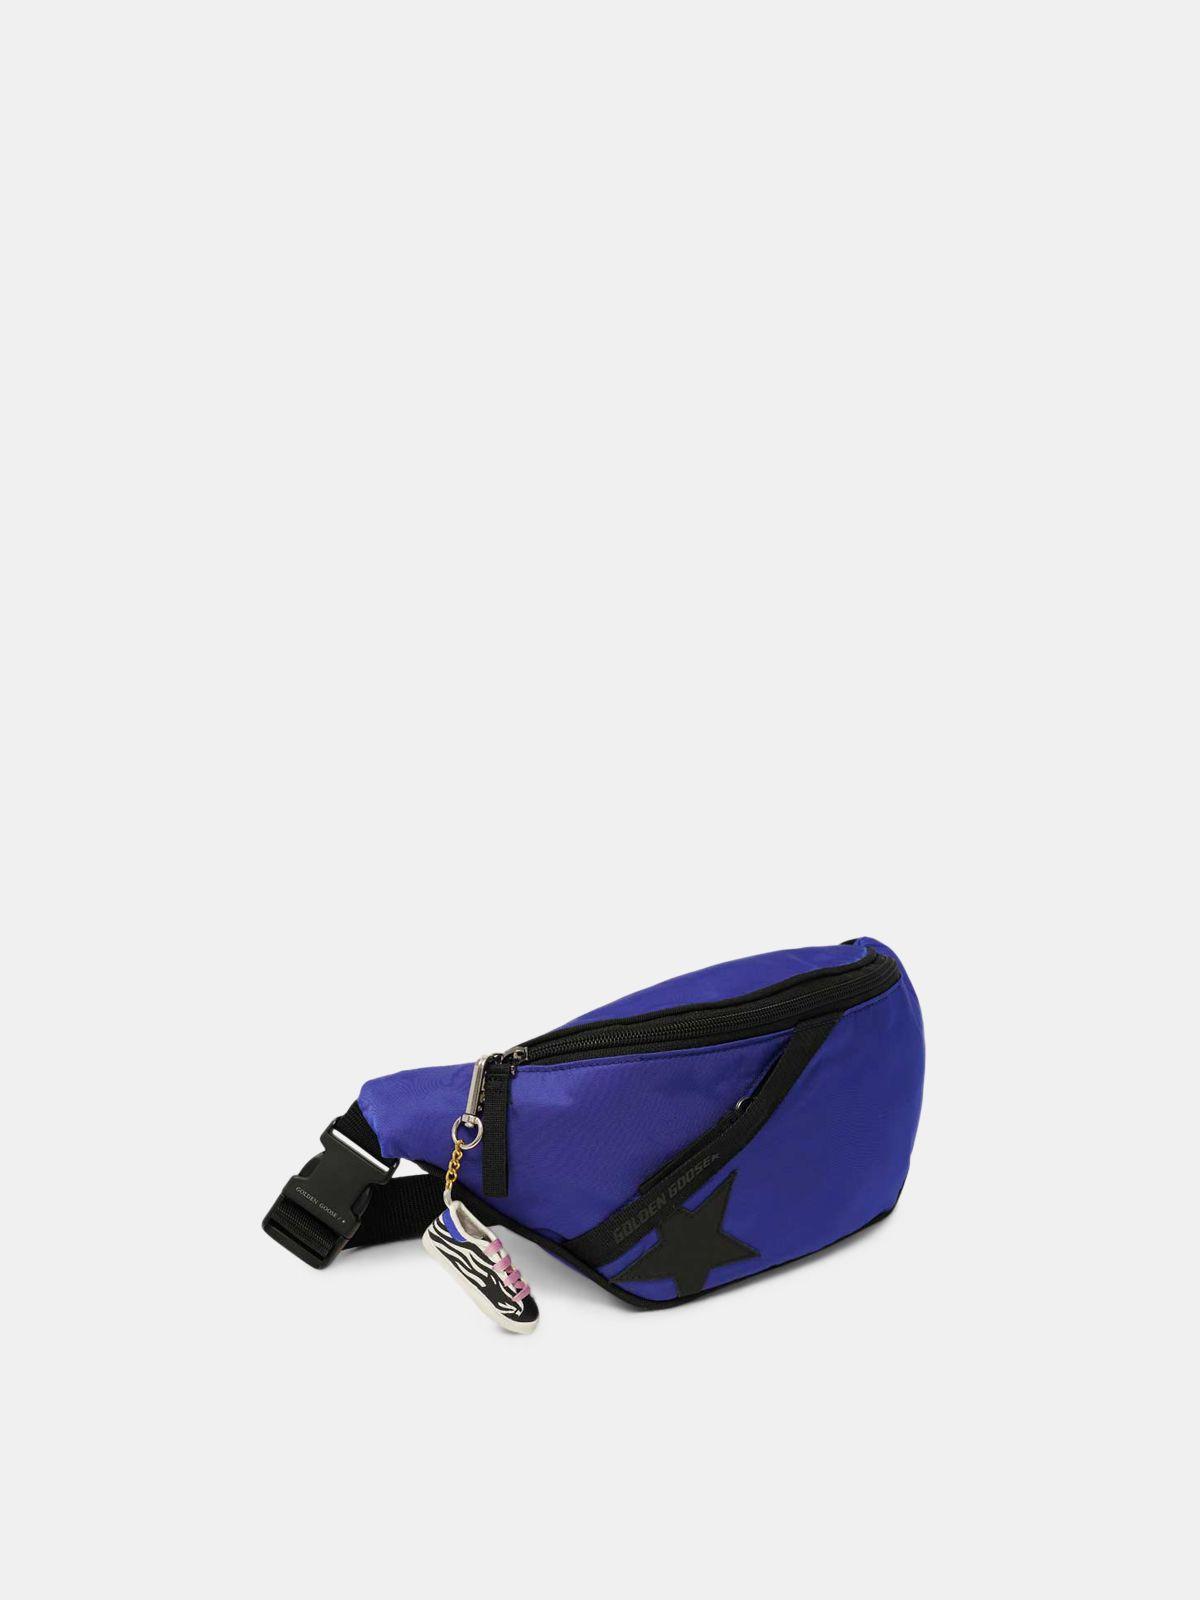 Golden Goose - Royal blue nylon Journey belt bag in